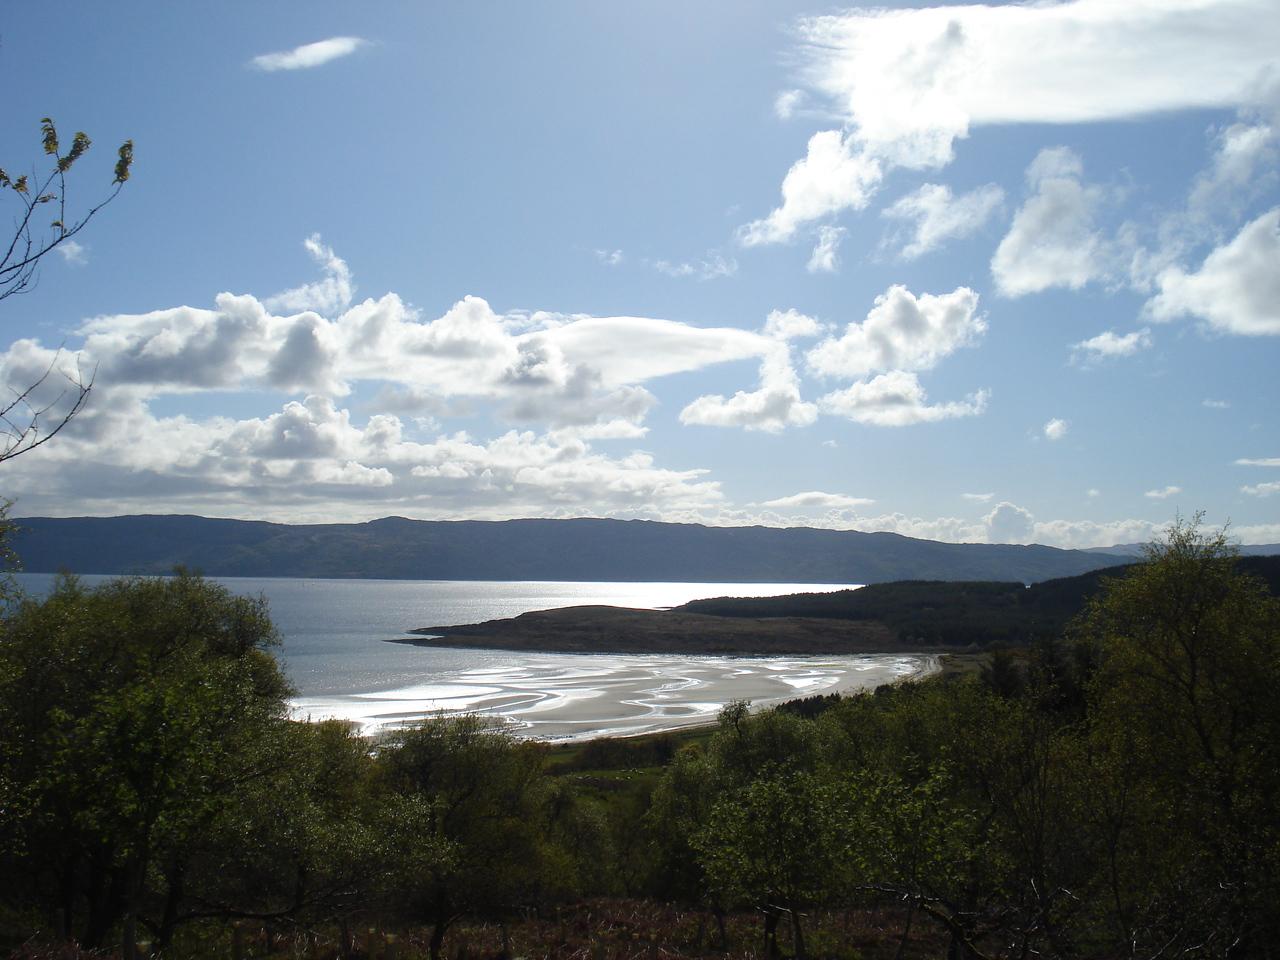 Kilbride Bay and Beach on Loch Fyne, Scotland